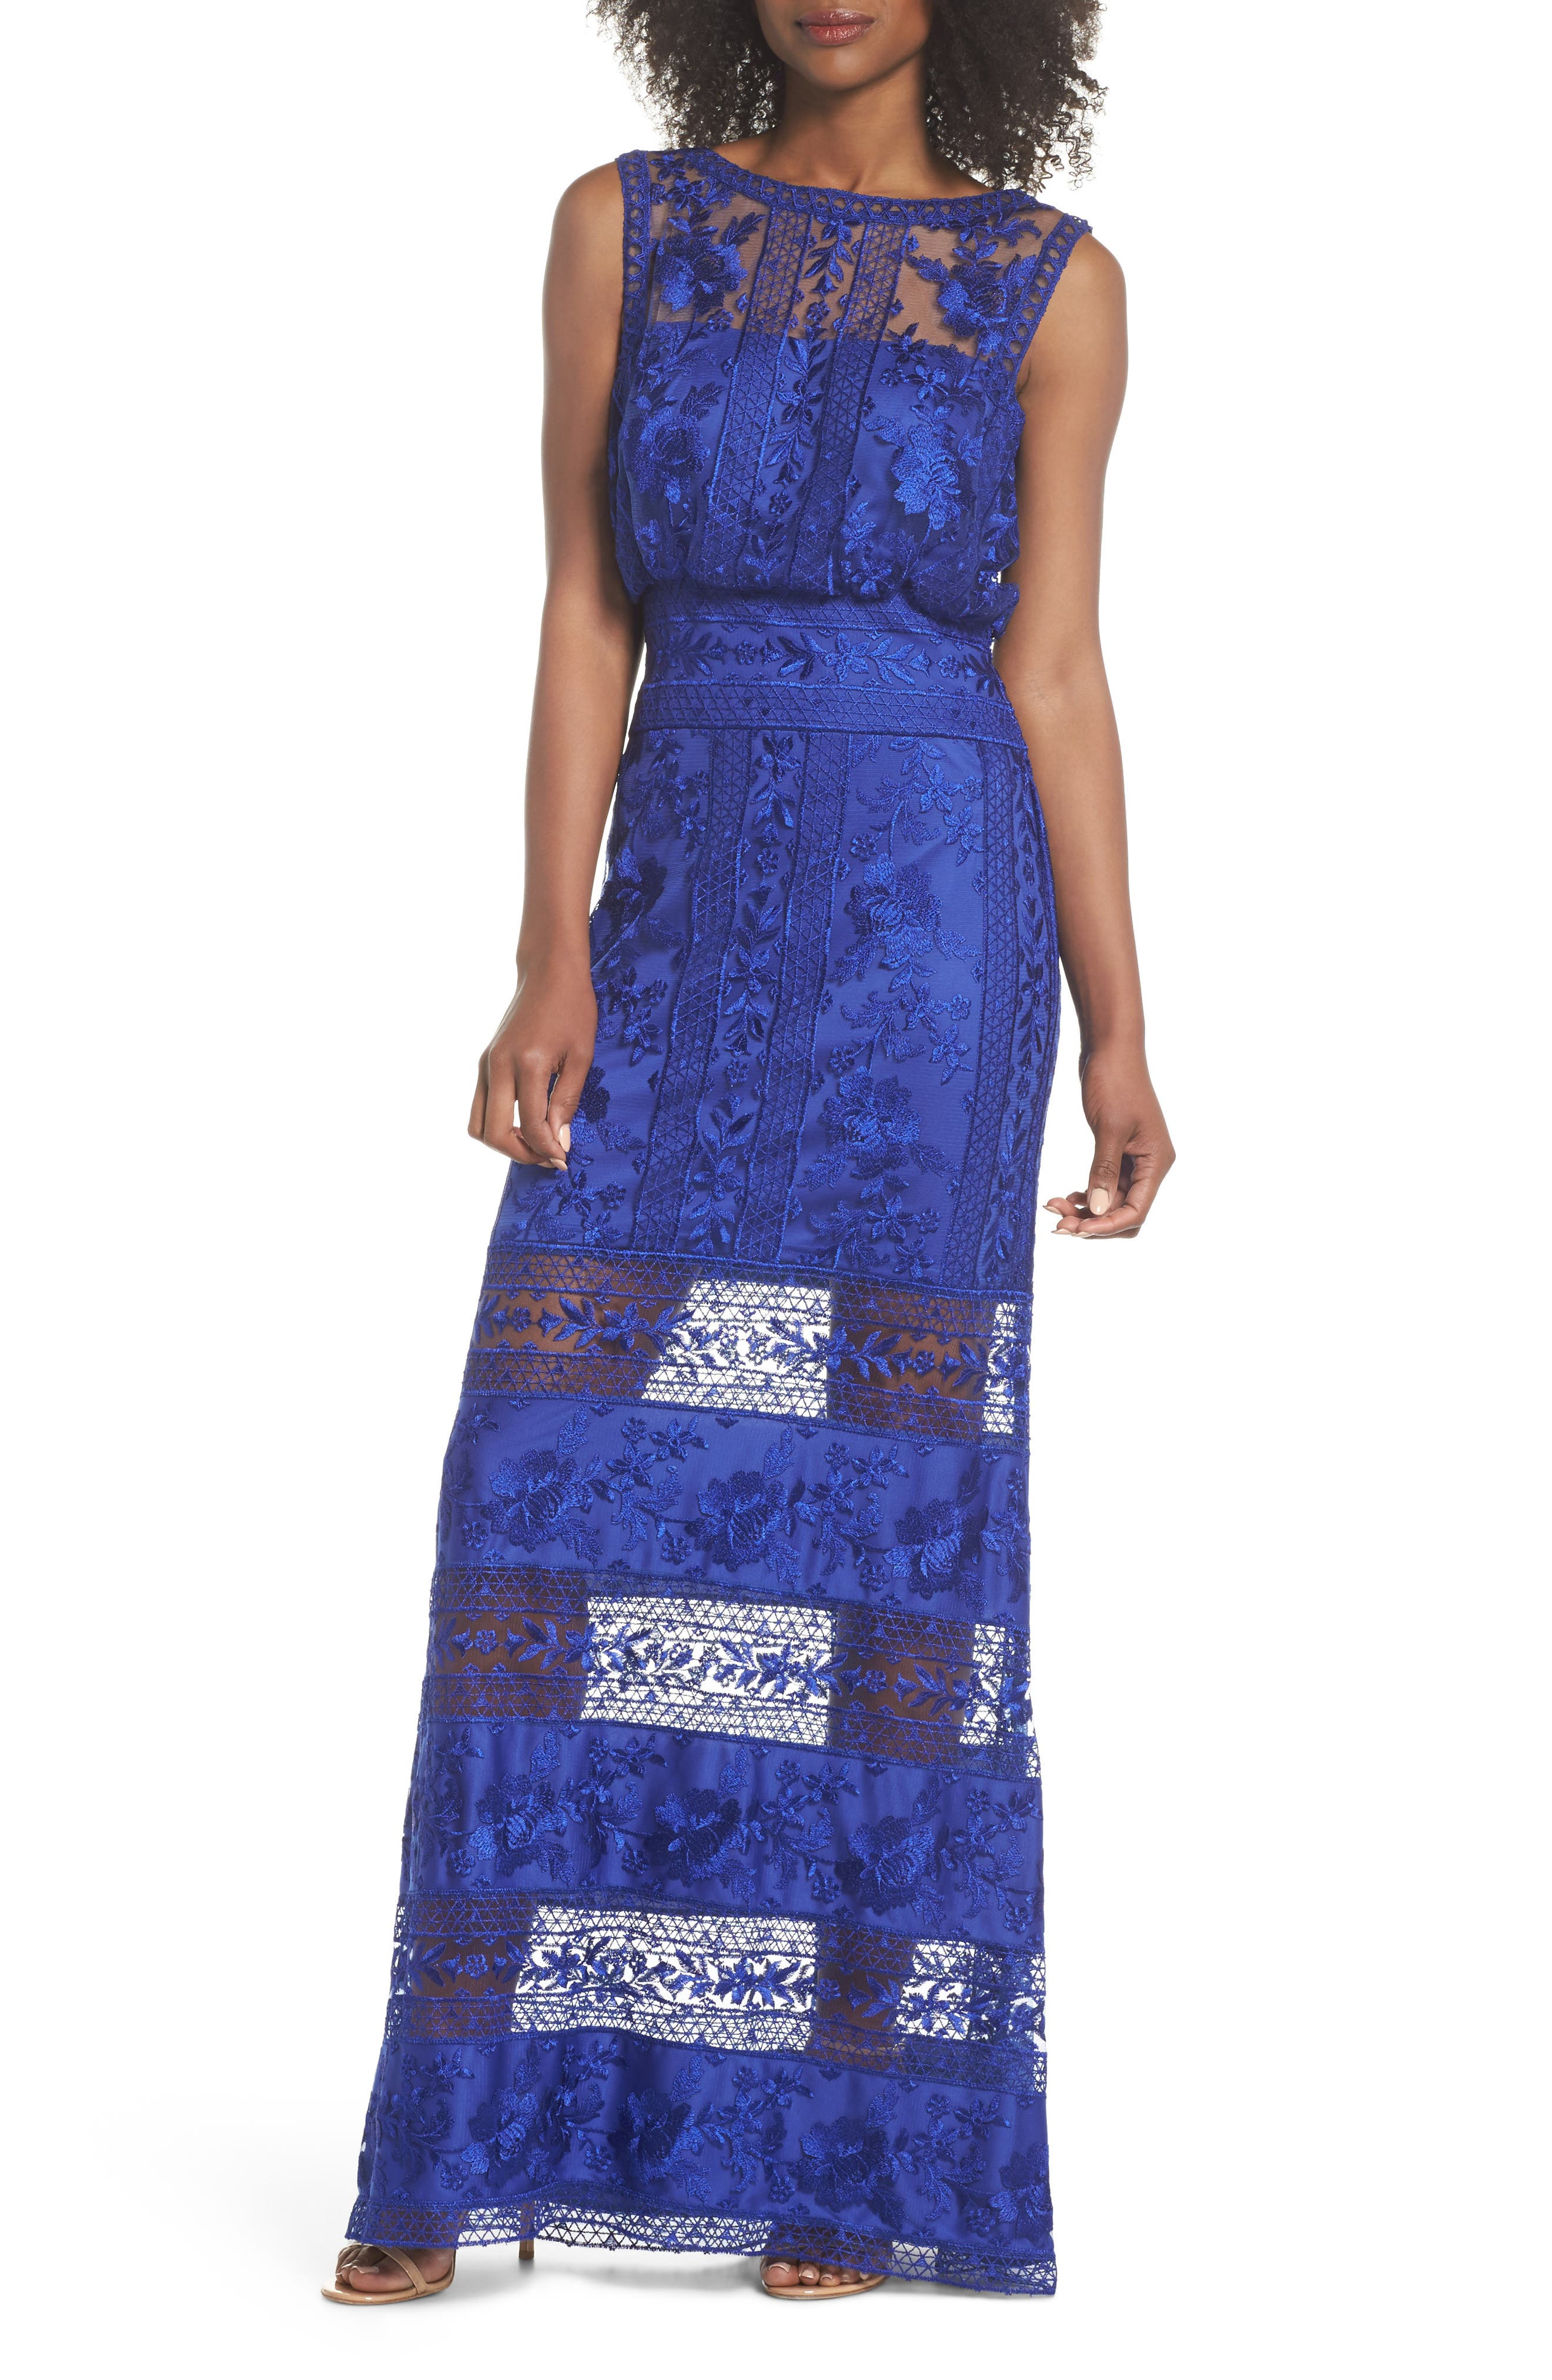 Main Image - Tadashi Shoji Kaisra Embroidered Lace Gown